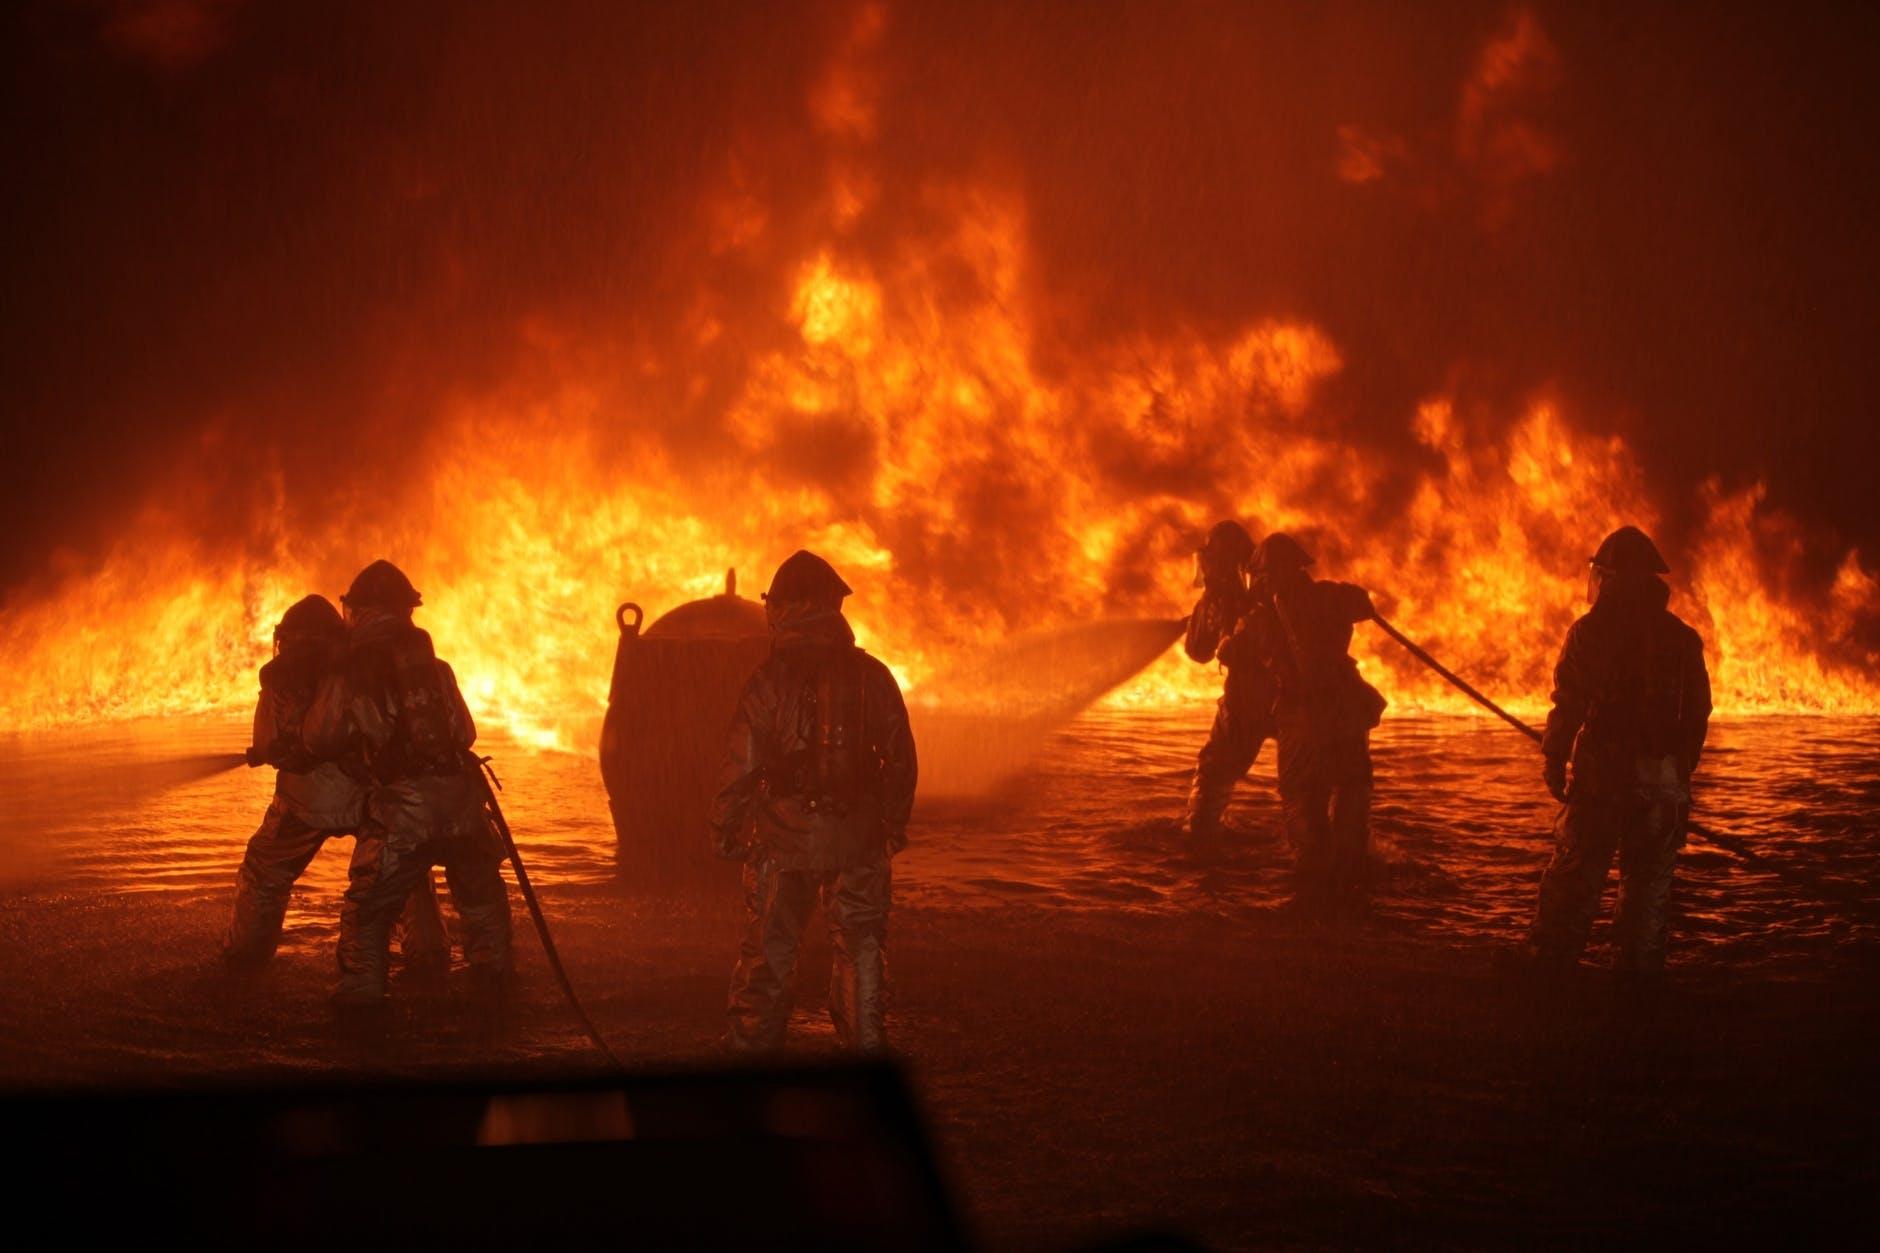 backlit breathing apparatus danger dangerous